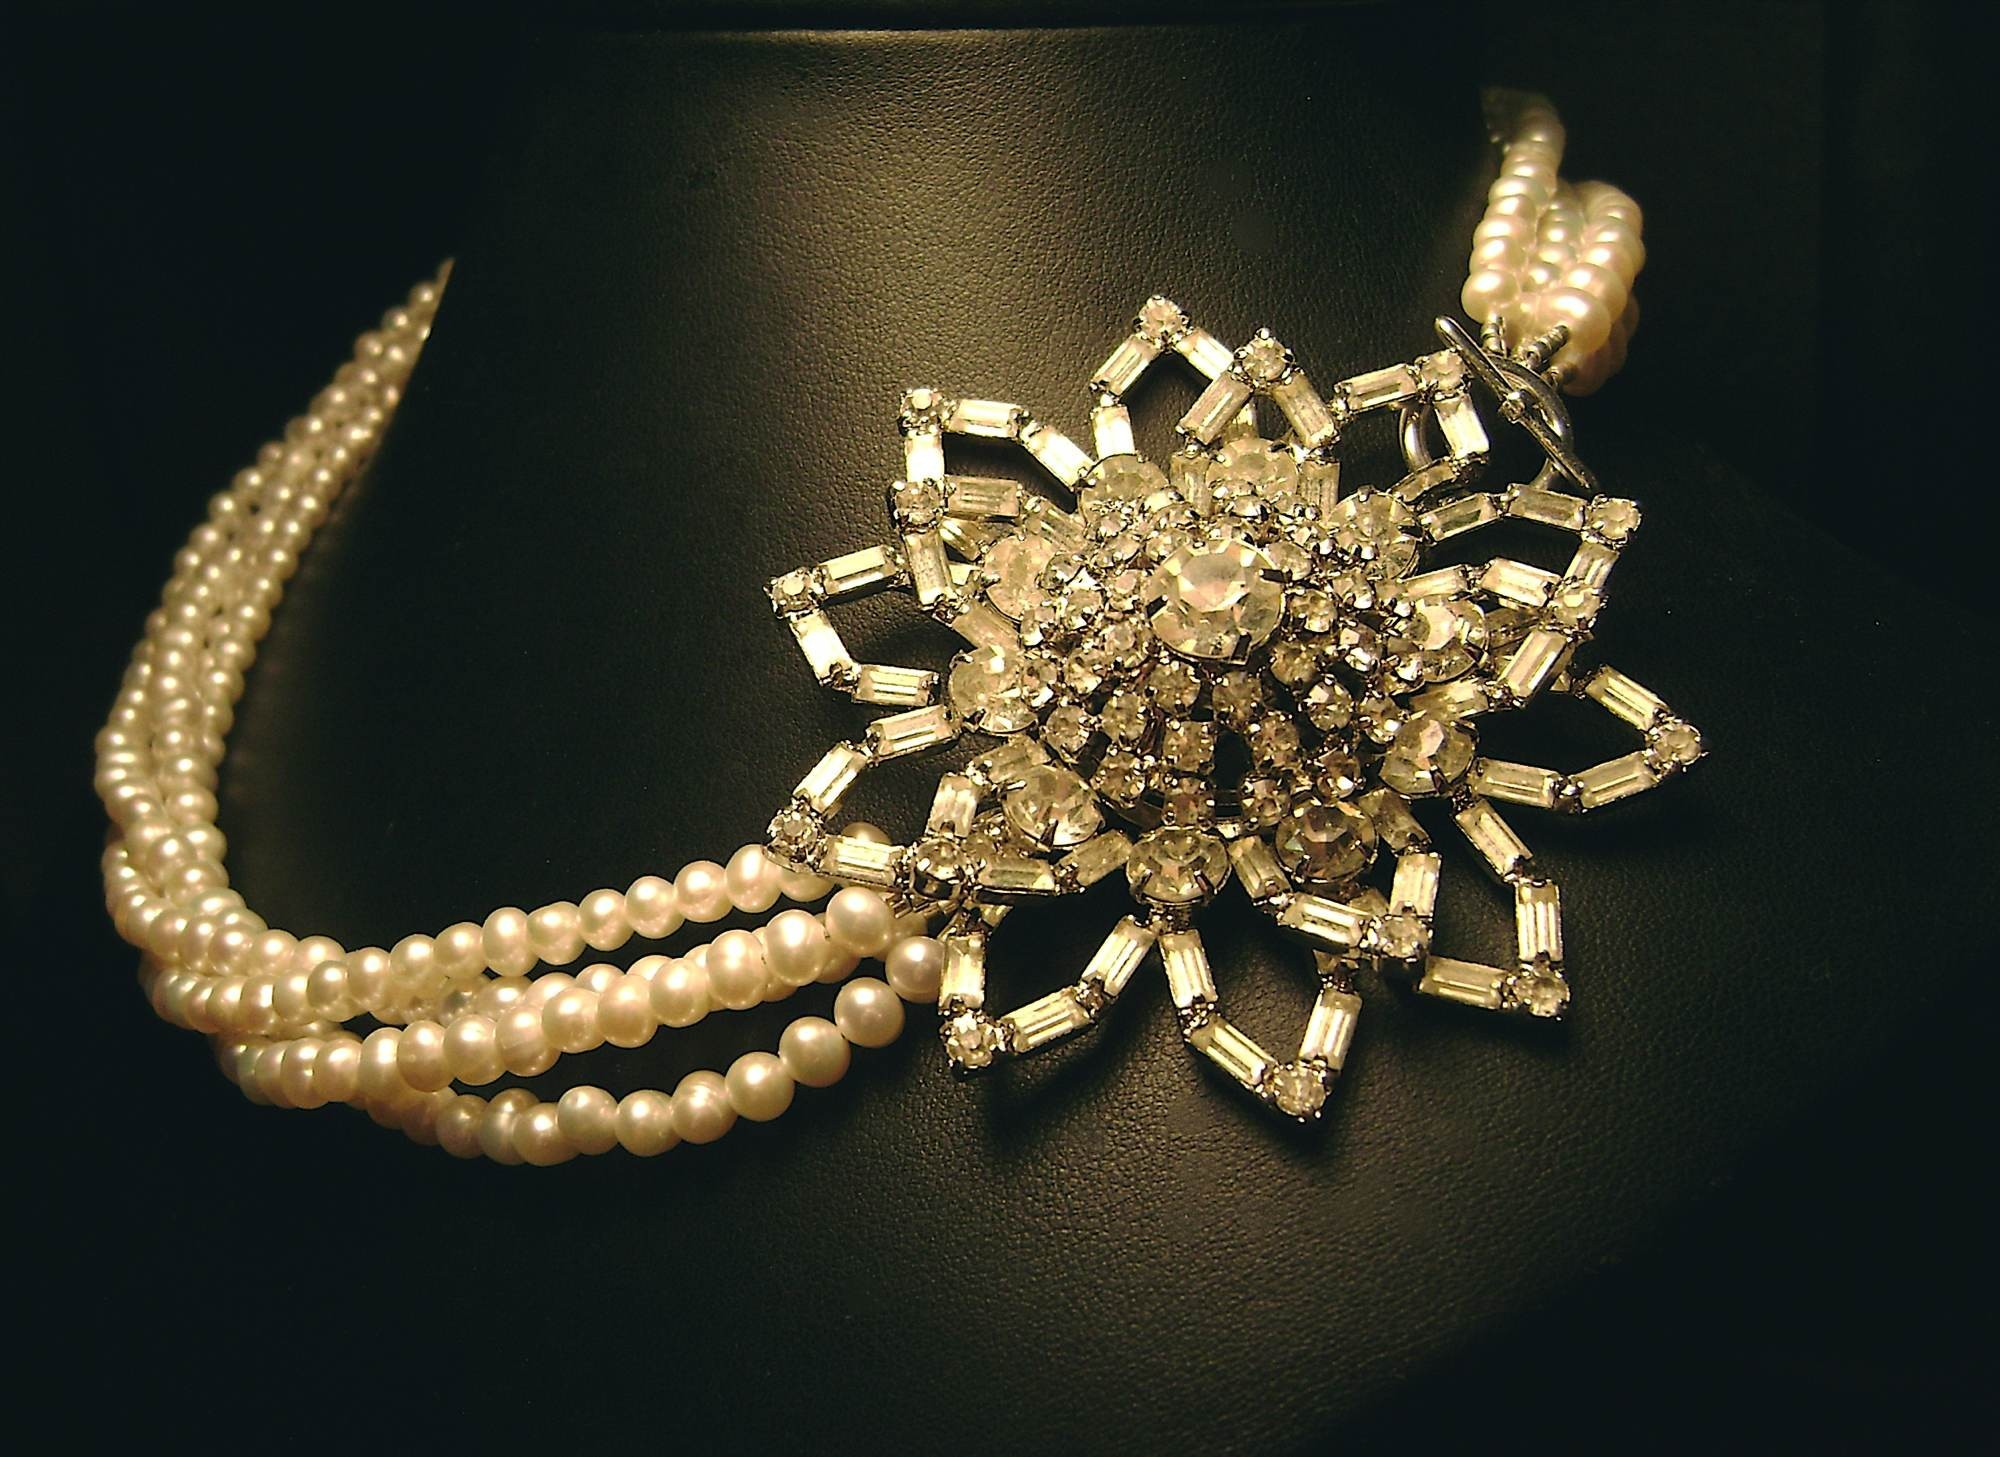 Flowers & Decor, Jewelry, Necklaces, Vintage, Flower, Necklace, Rhinestone, Pearl, Etsy, Handmade, Damselle jewelry